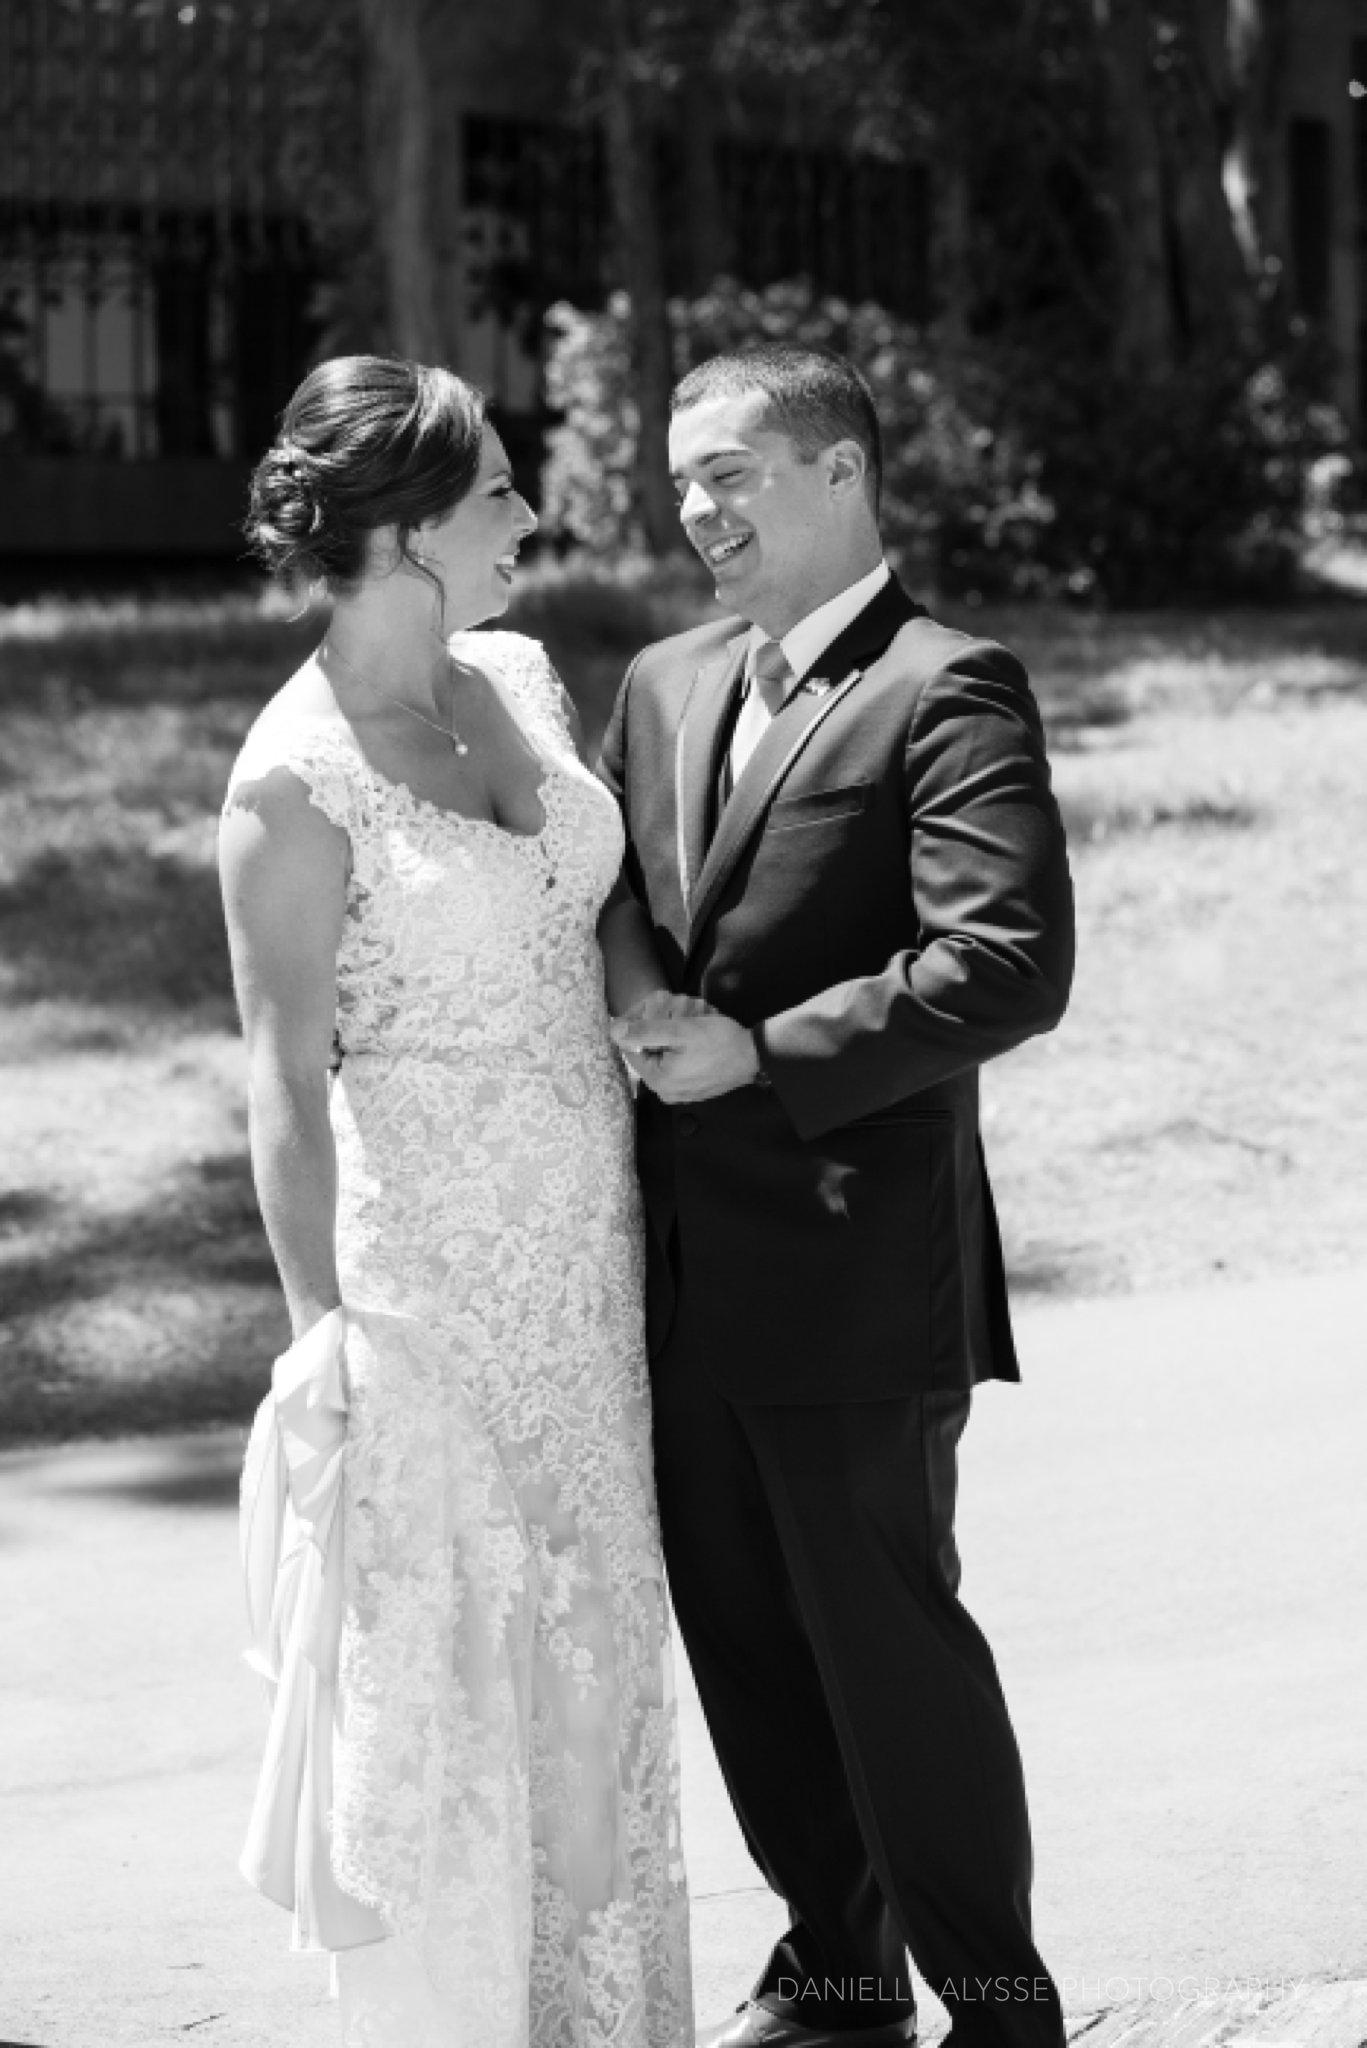 170429_blog_kimberly_ben_wedding_san_mateo_curiodyssey_danielle_alysse_photography_sacramento_photographer0182_WEB.jpg